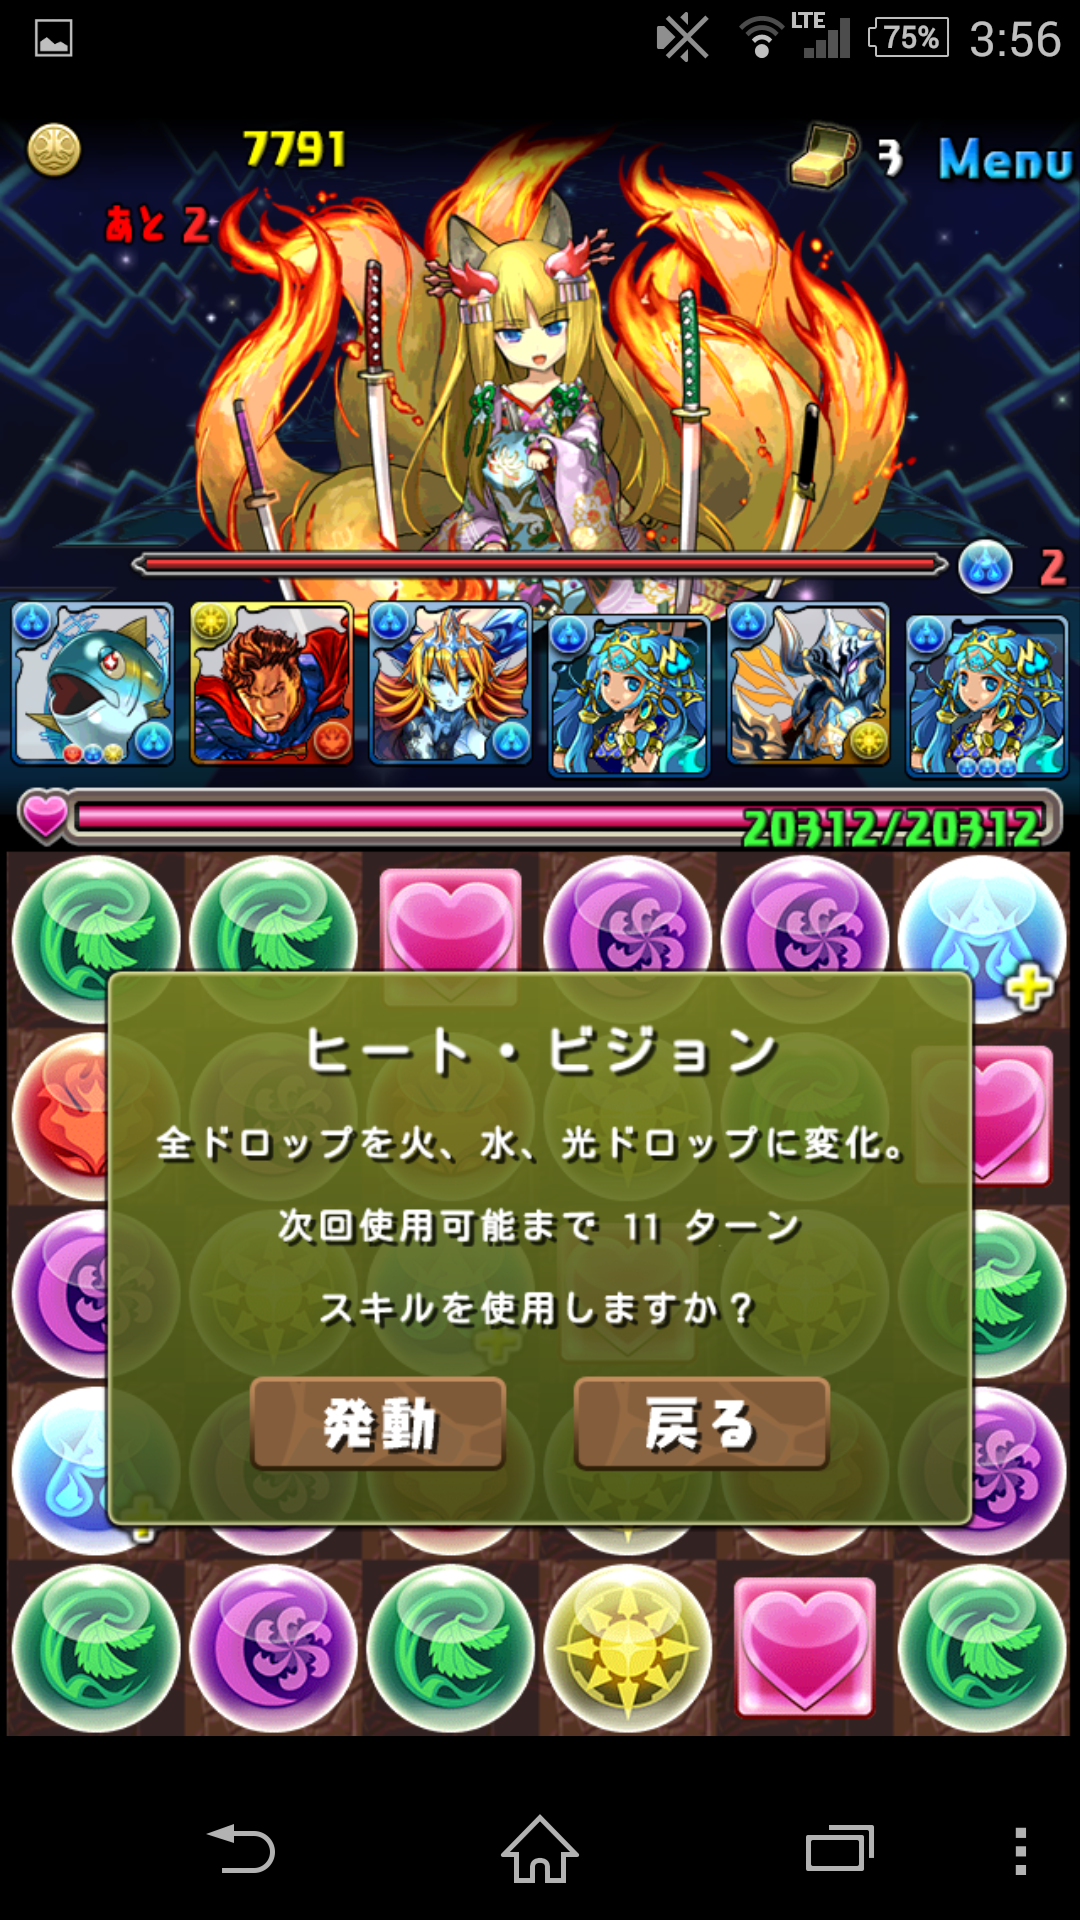 Screenshot_2014-12-16-03-56-18.png